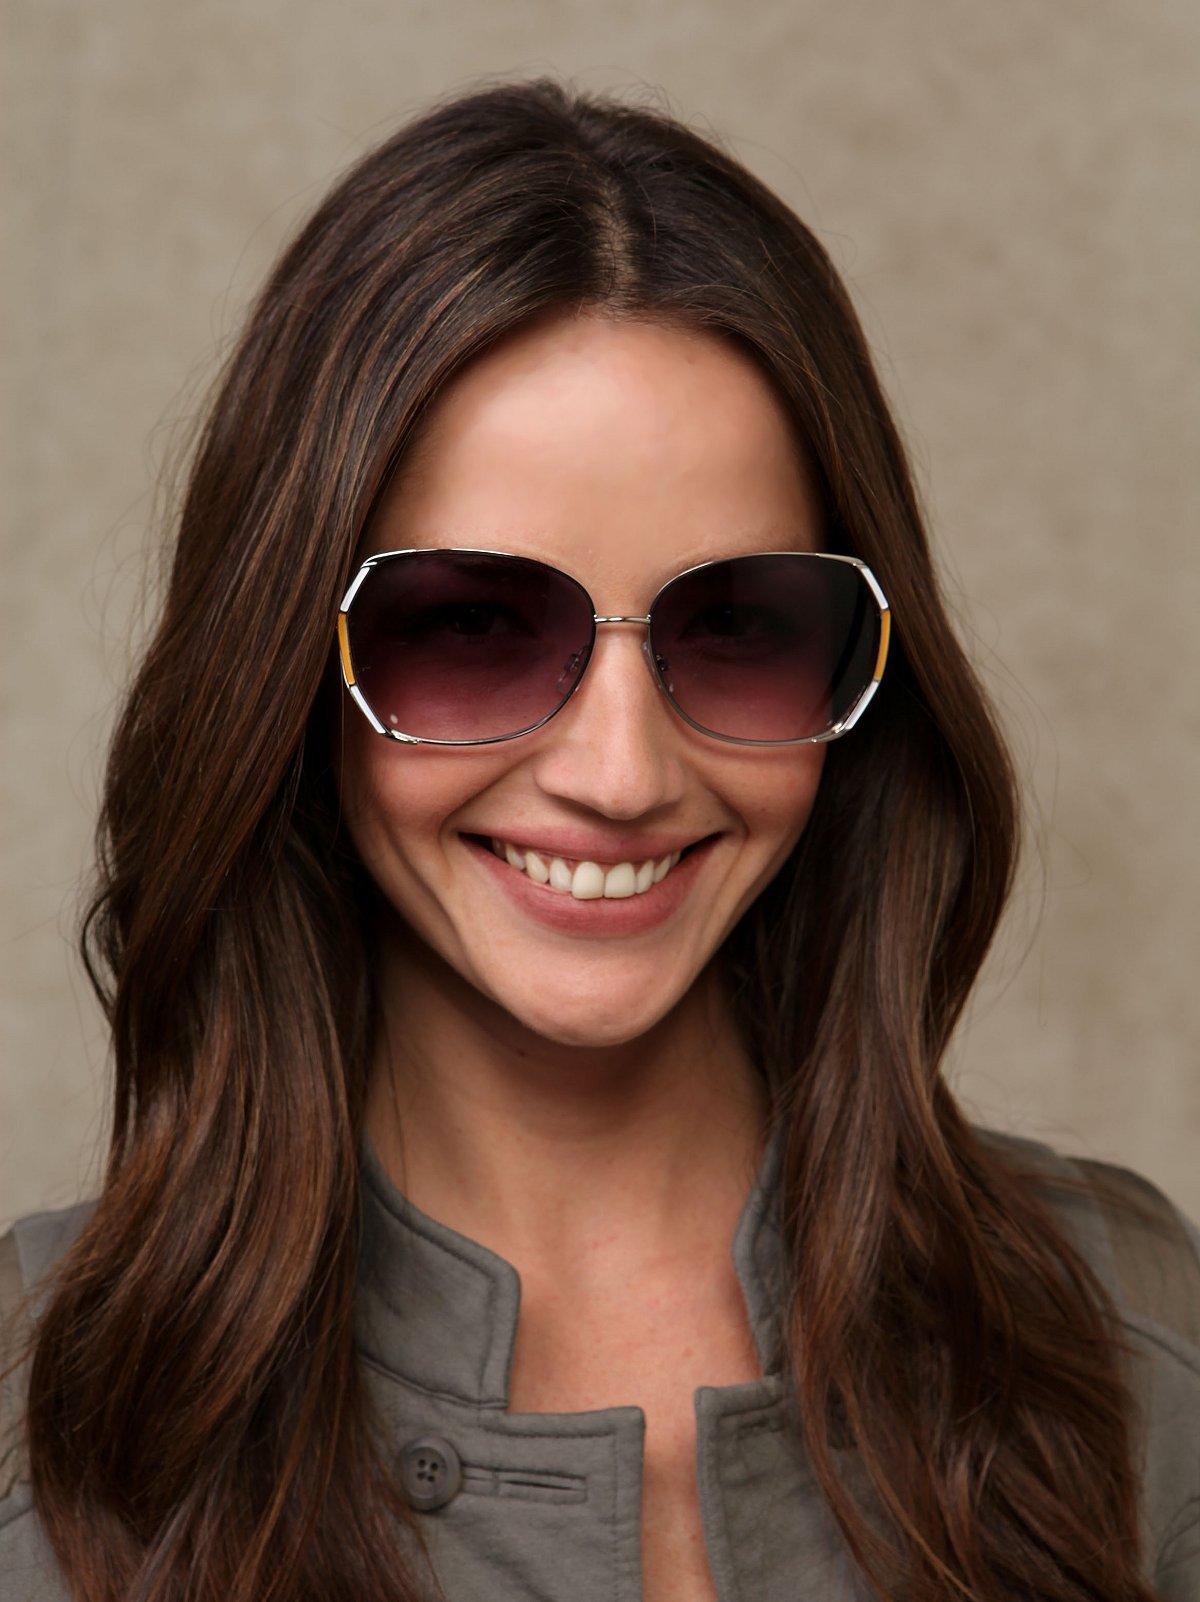 Lovely Lady Sunglasses